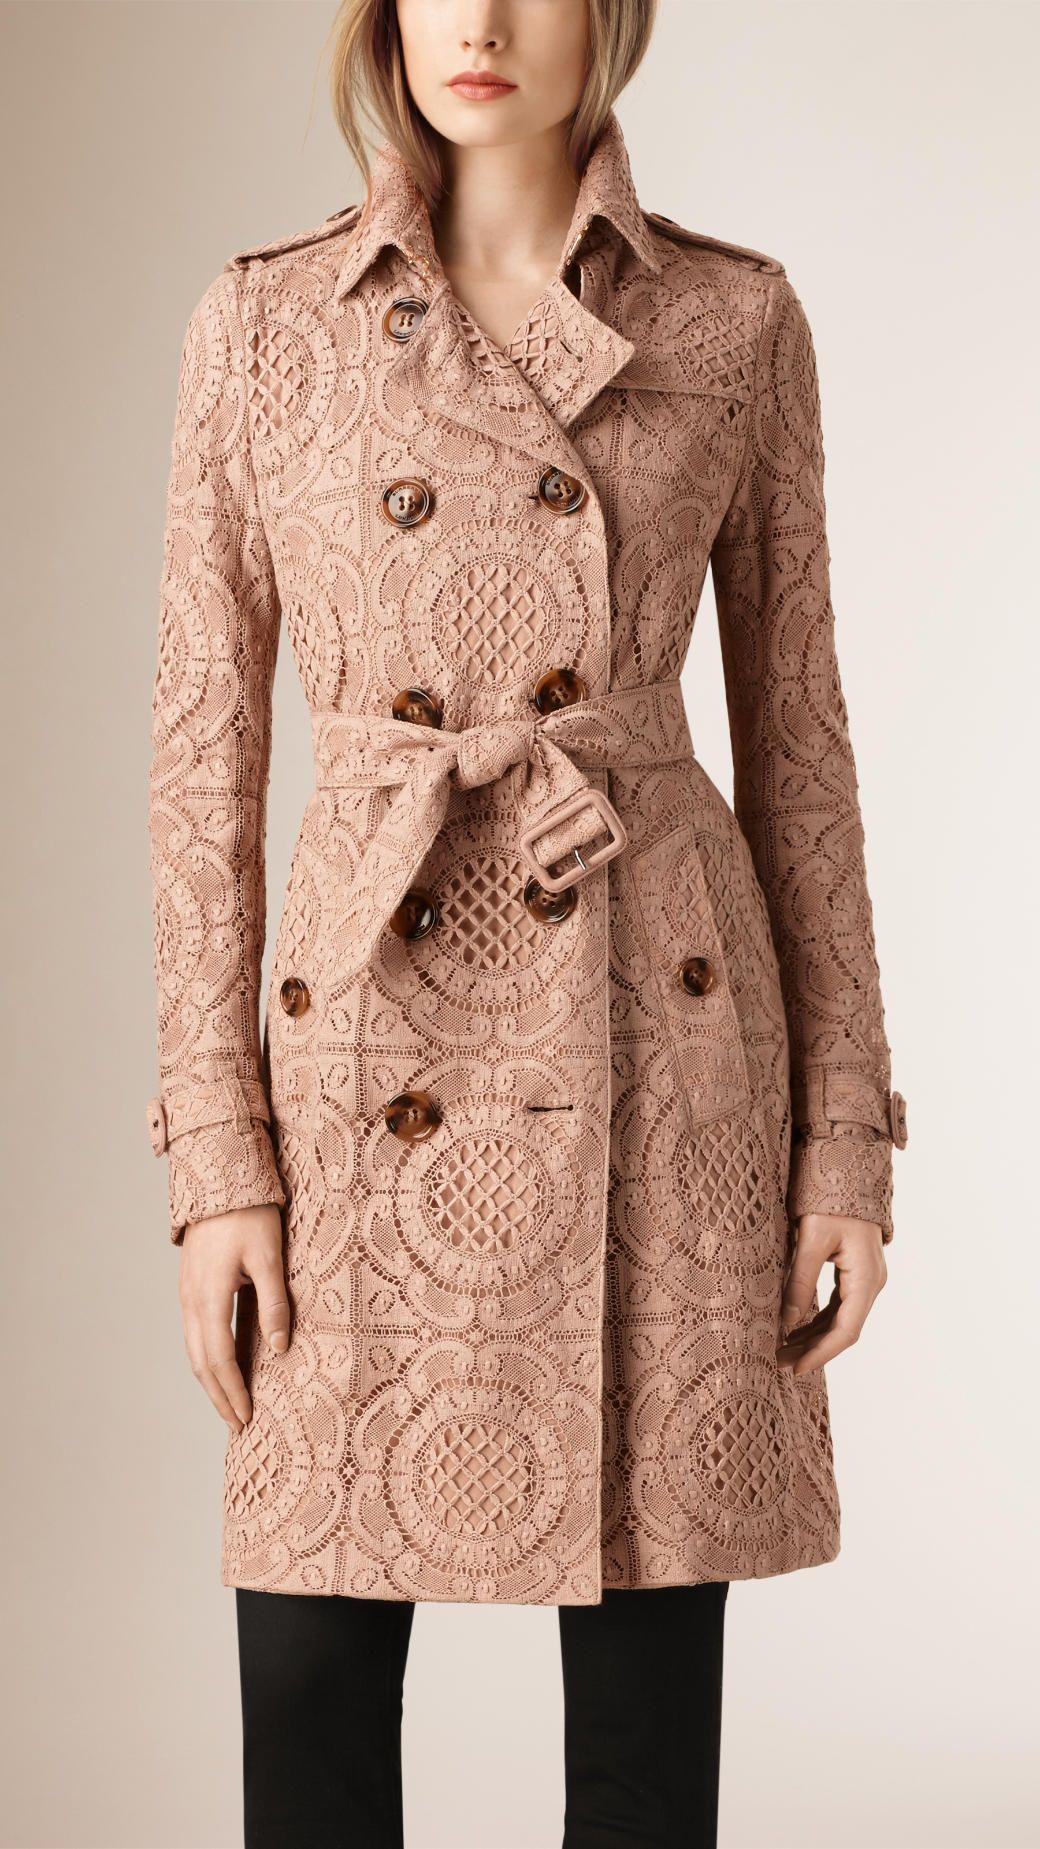 Женские пальто и пиджаки   Burberry   Burberry my love   Pinterest ... 9fd99216f2b